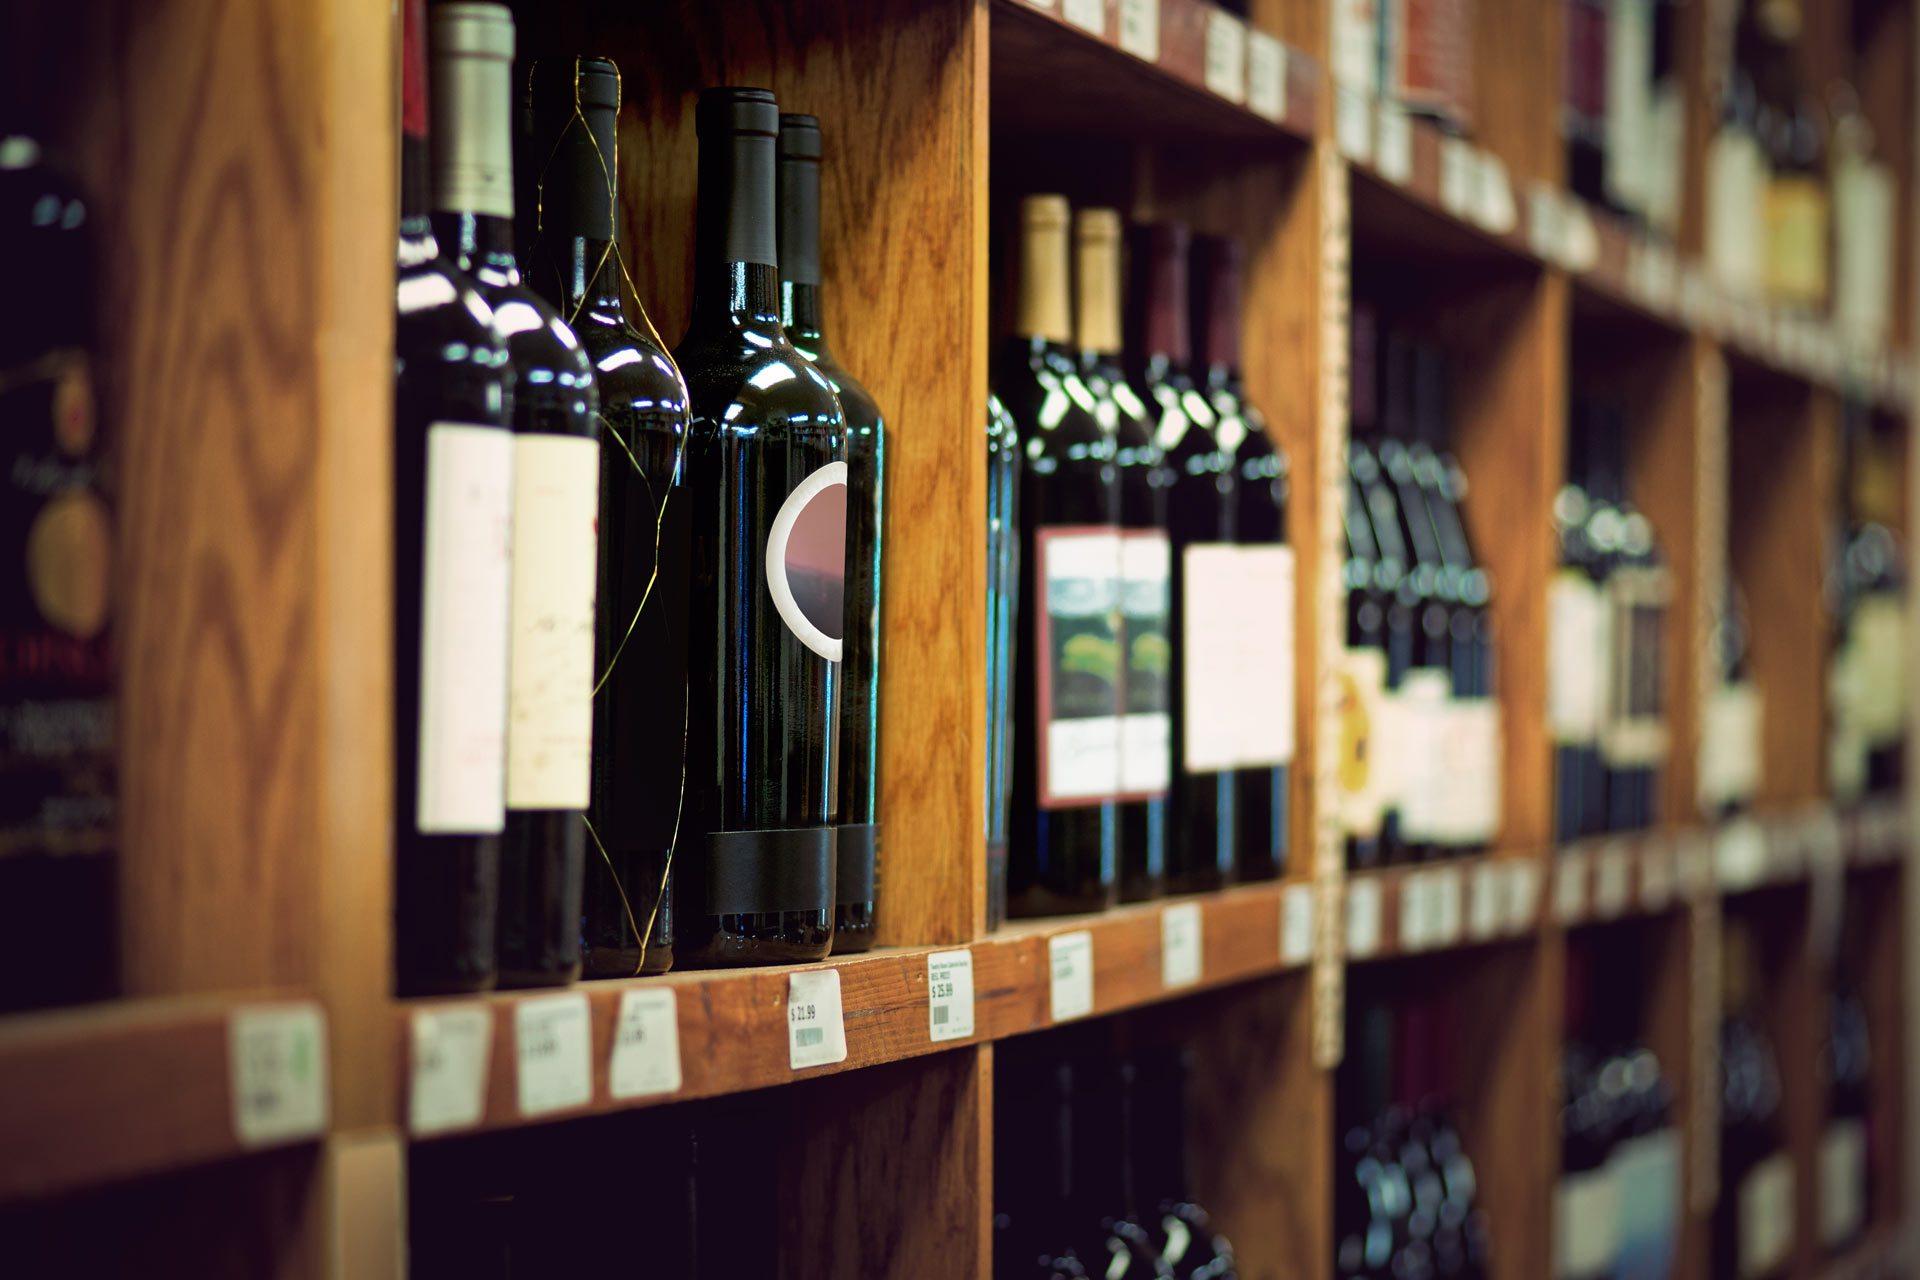 PA Hotel Ipswich | Award Winning Harry Brown's Liquor Store